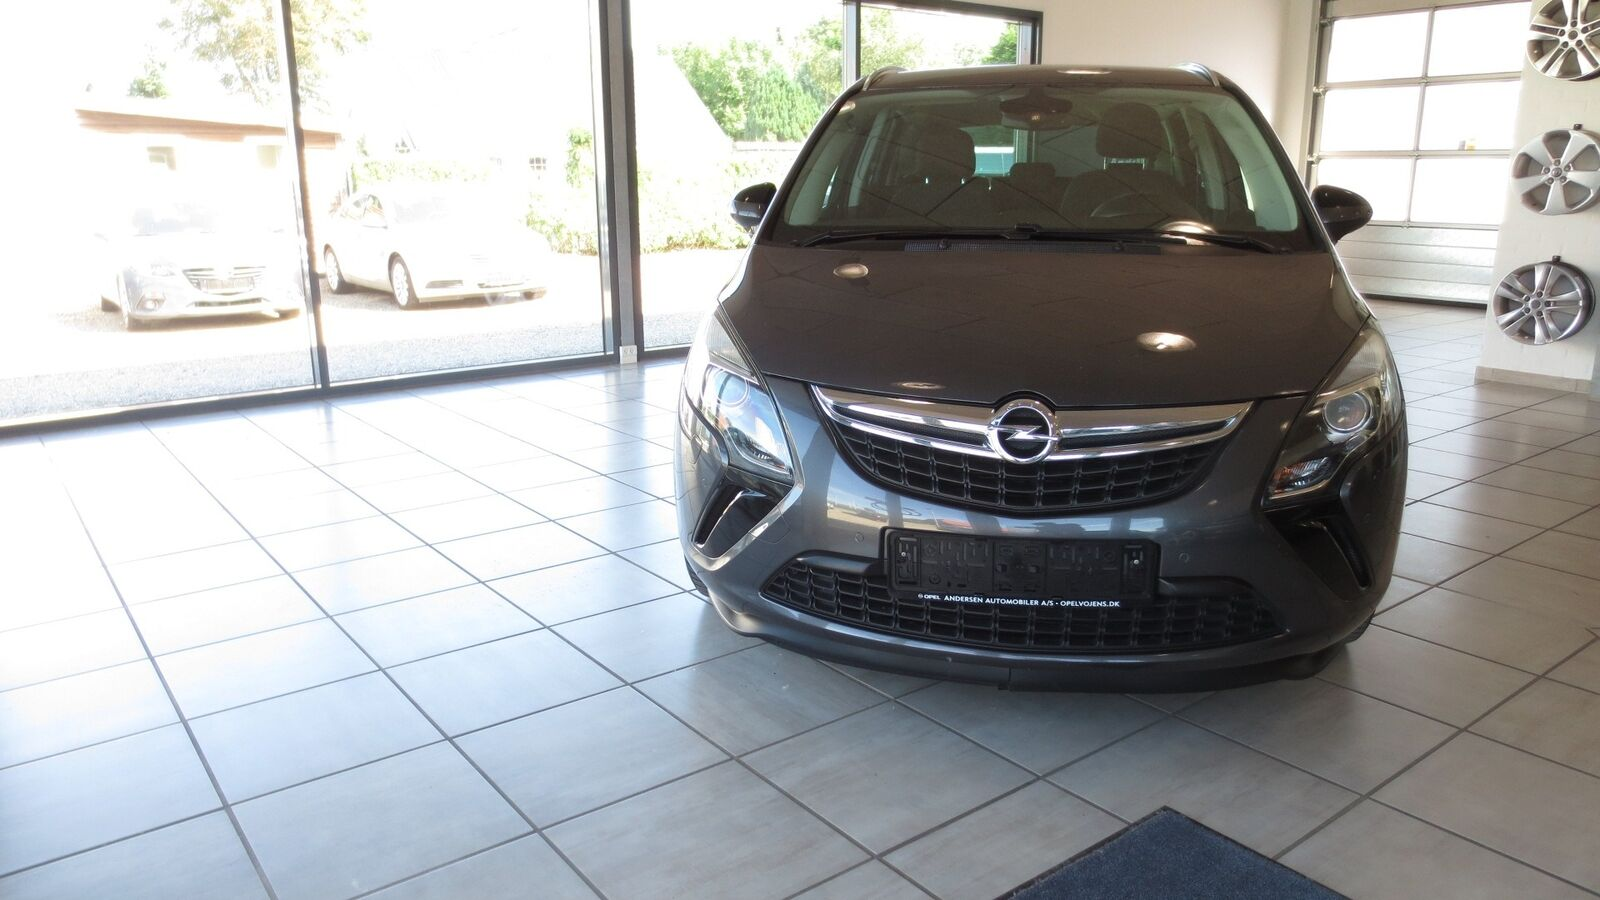 Opel Zafira Tourer 2,0 CDTi 165 Enjoy eco 5d